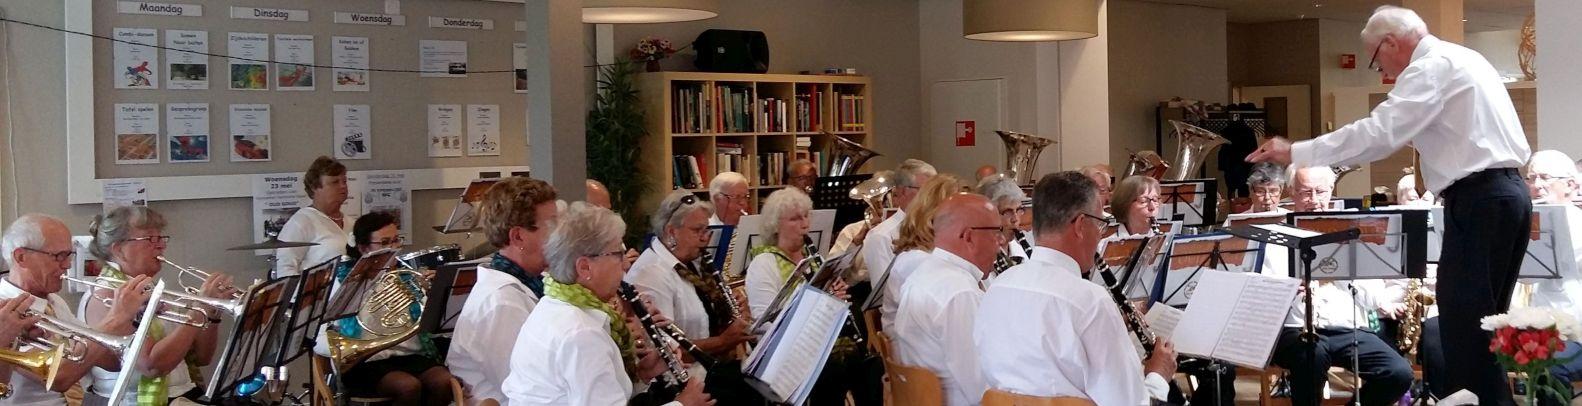 Oud Goud in Concert